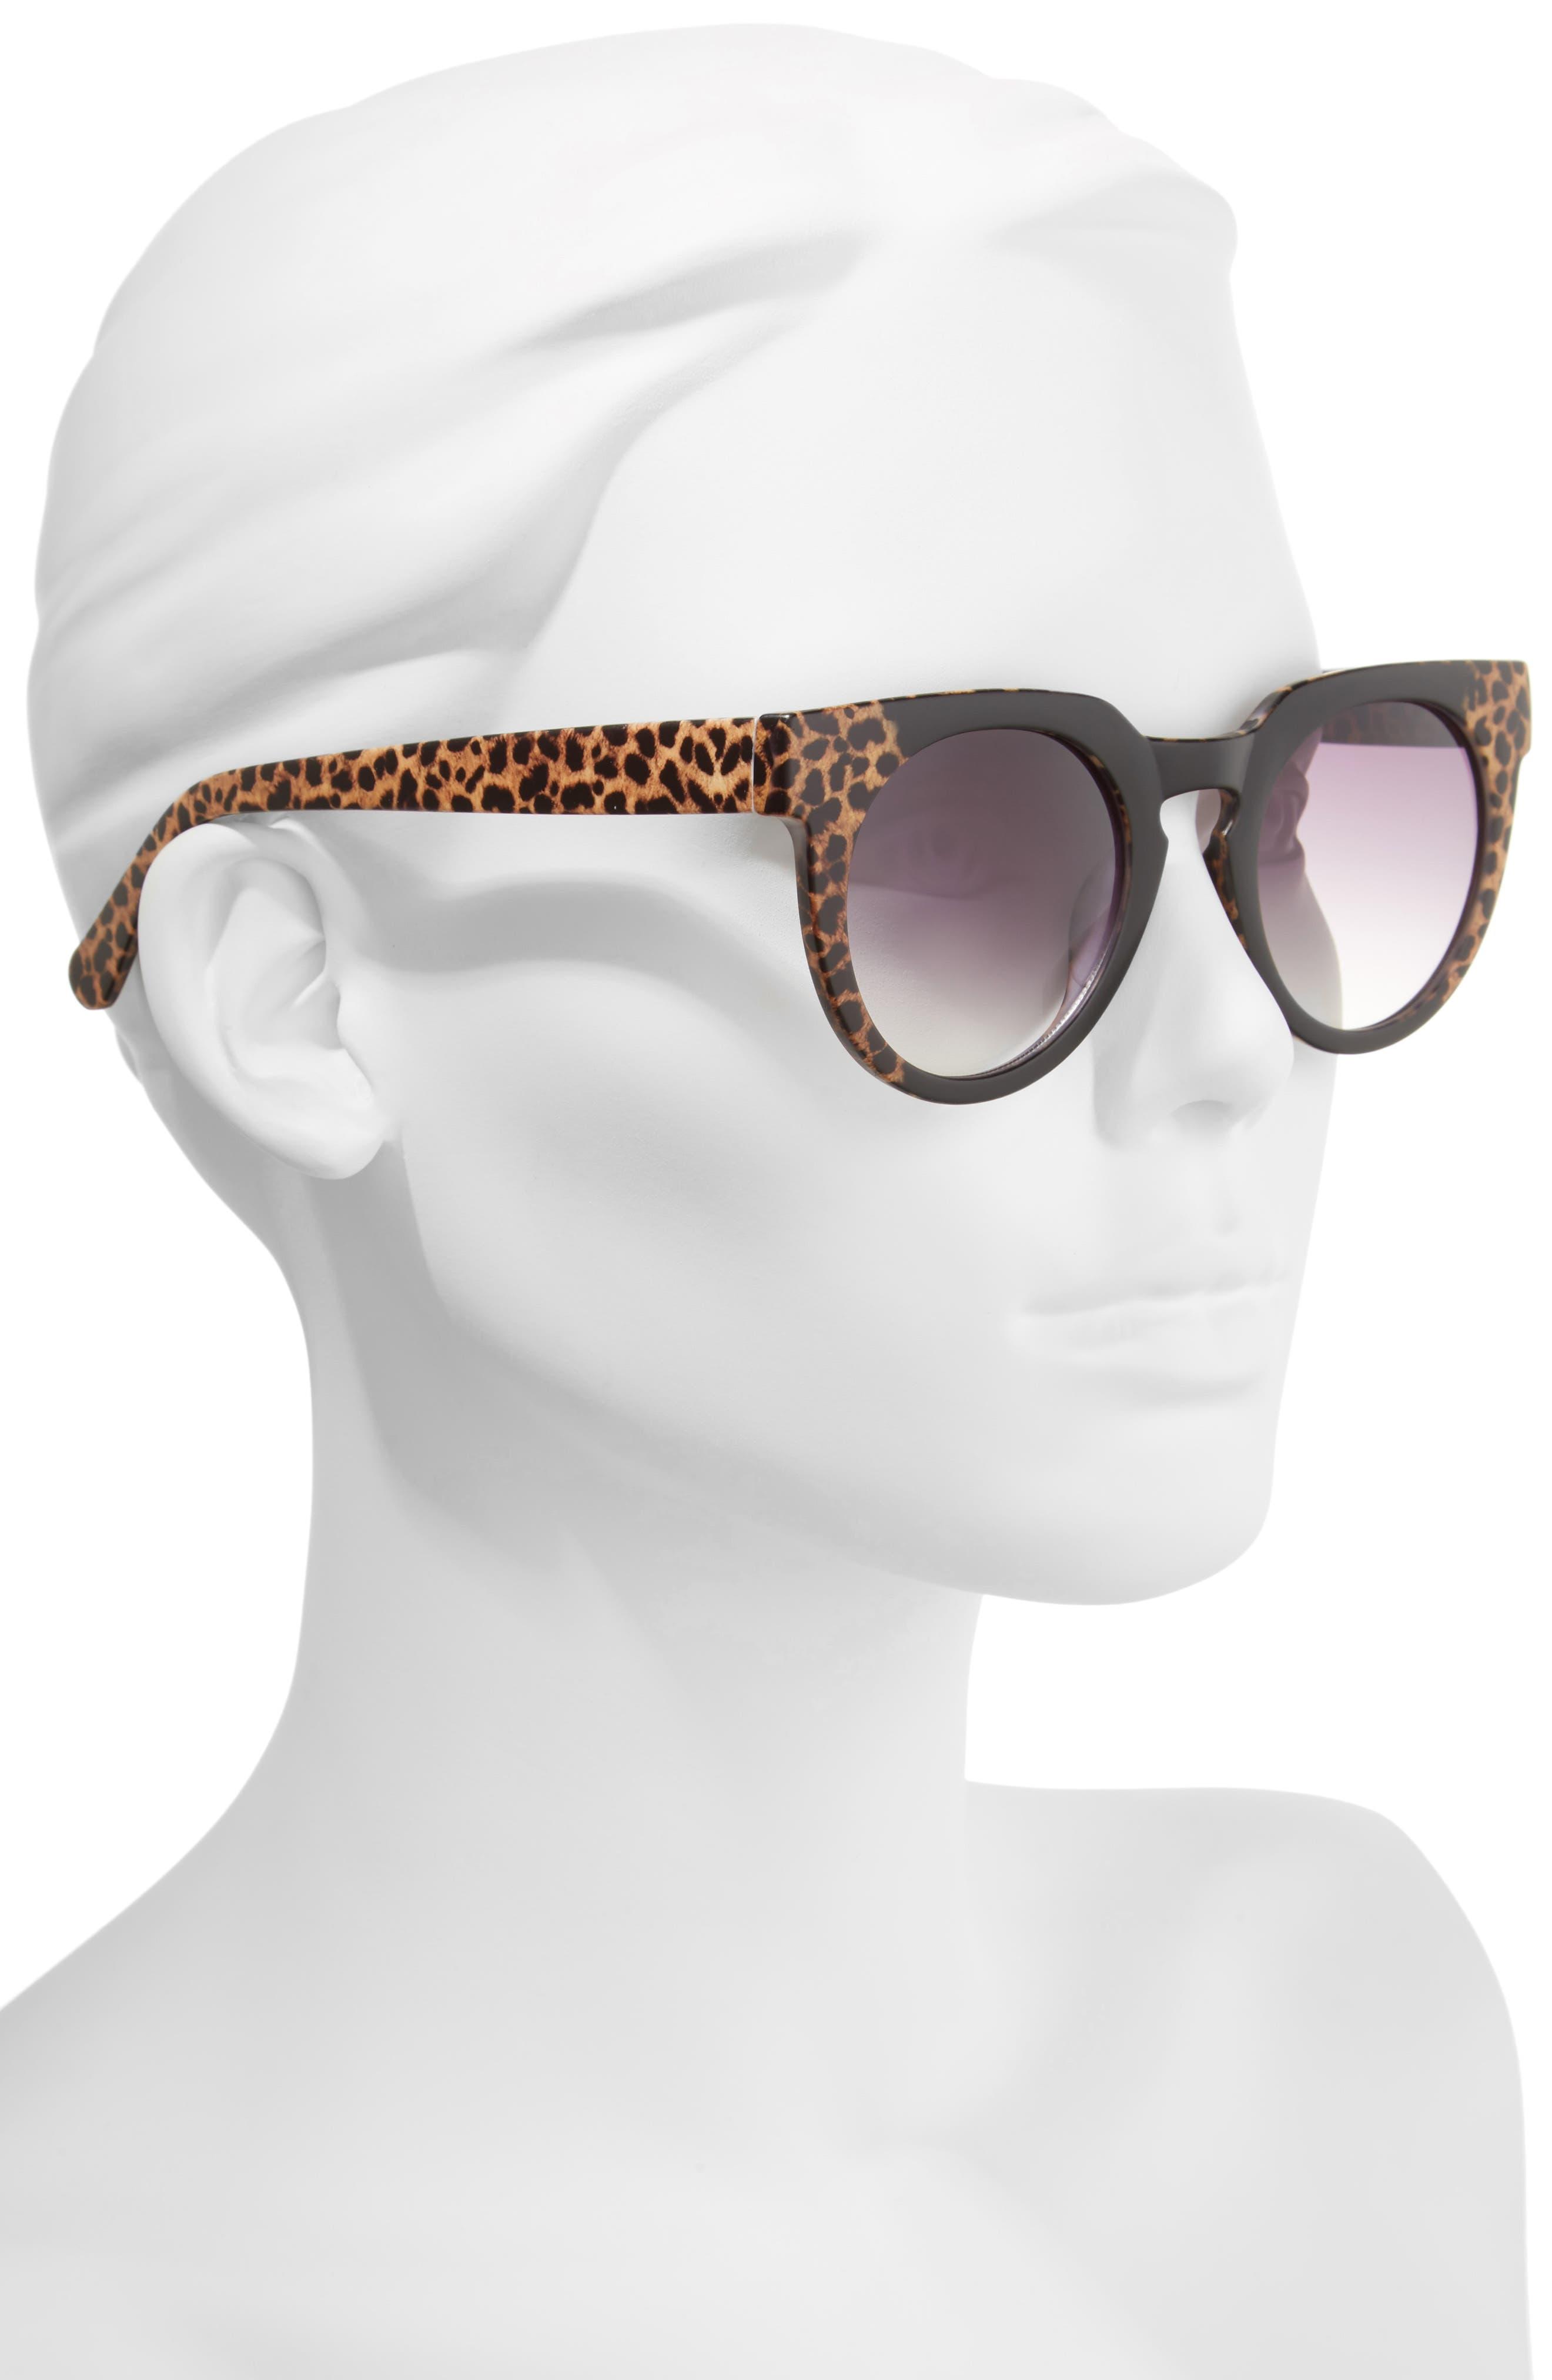 47mm Animal Print Round Sunglasses,                             Alternate thumbnail 2, color,                             001